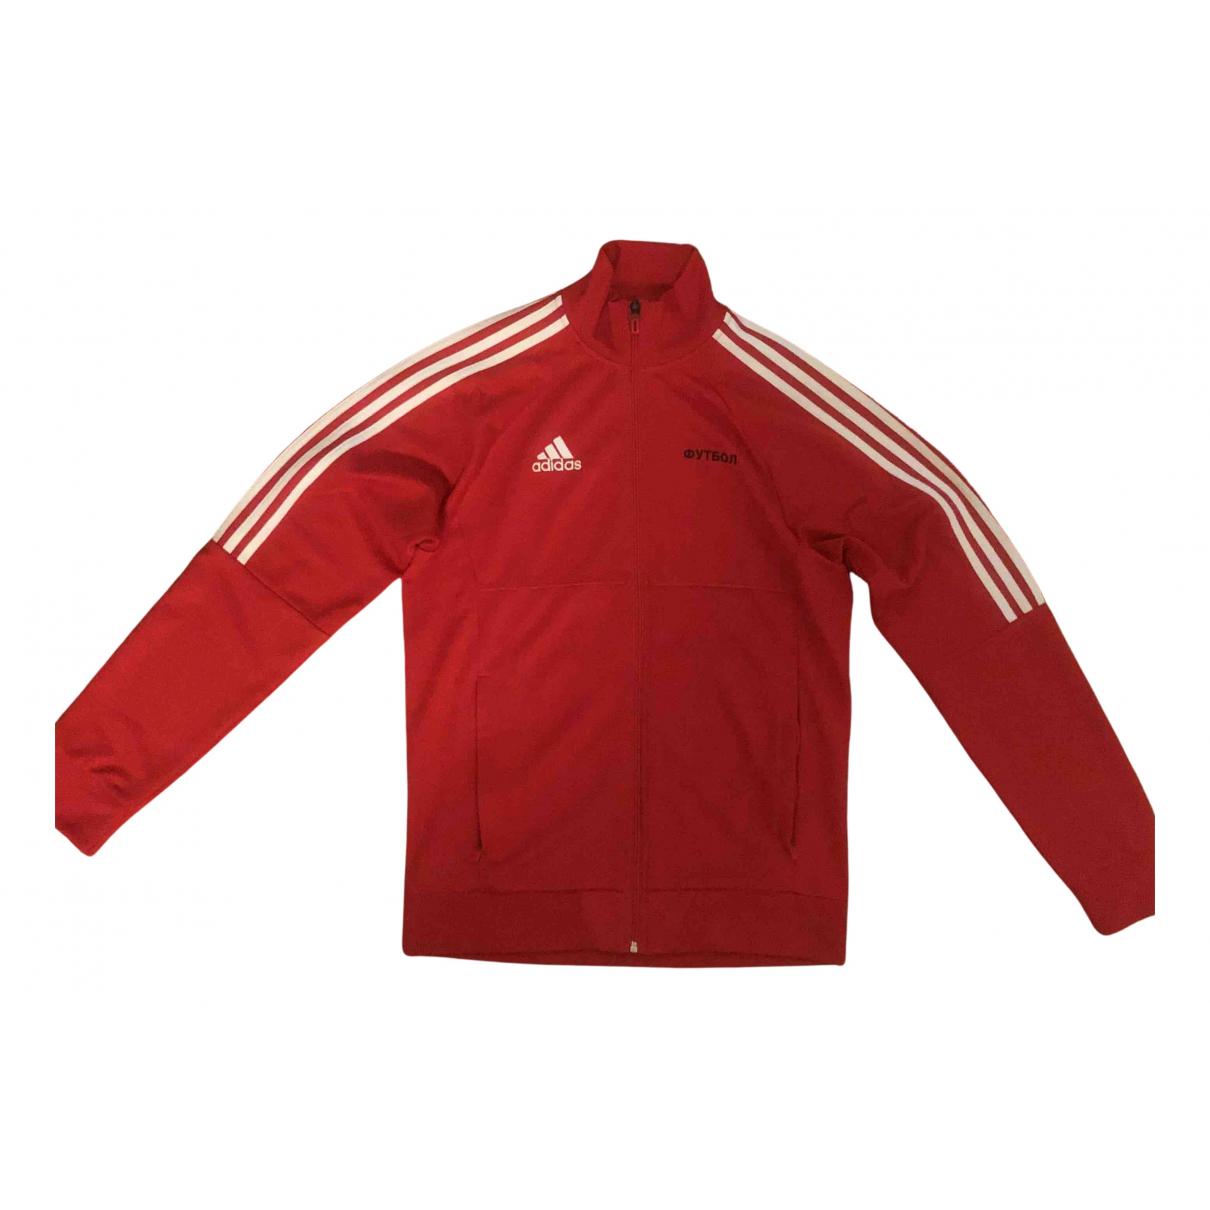 Adidas X Gosha Rubchinskiy N Red jacket for Men S International